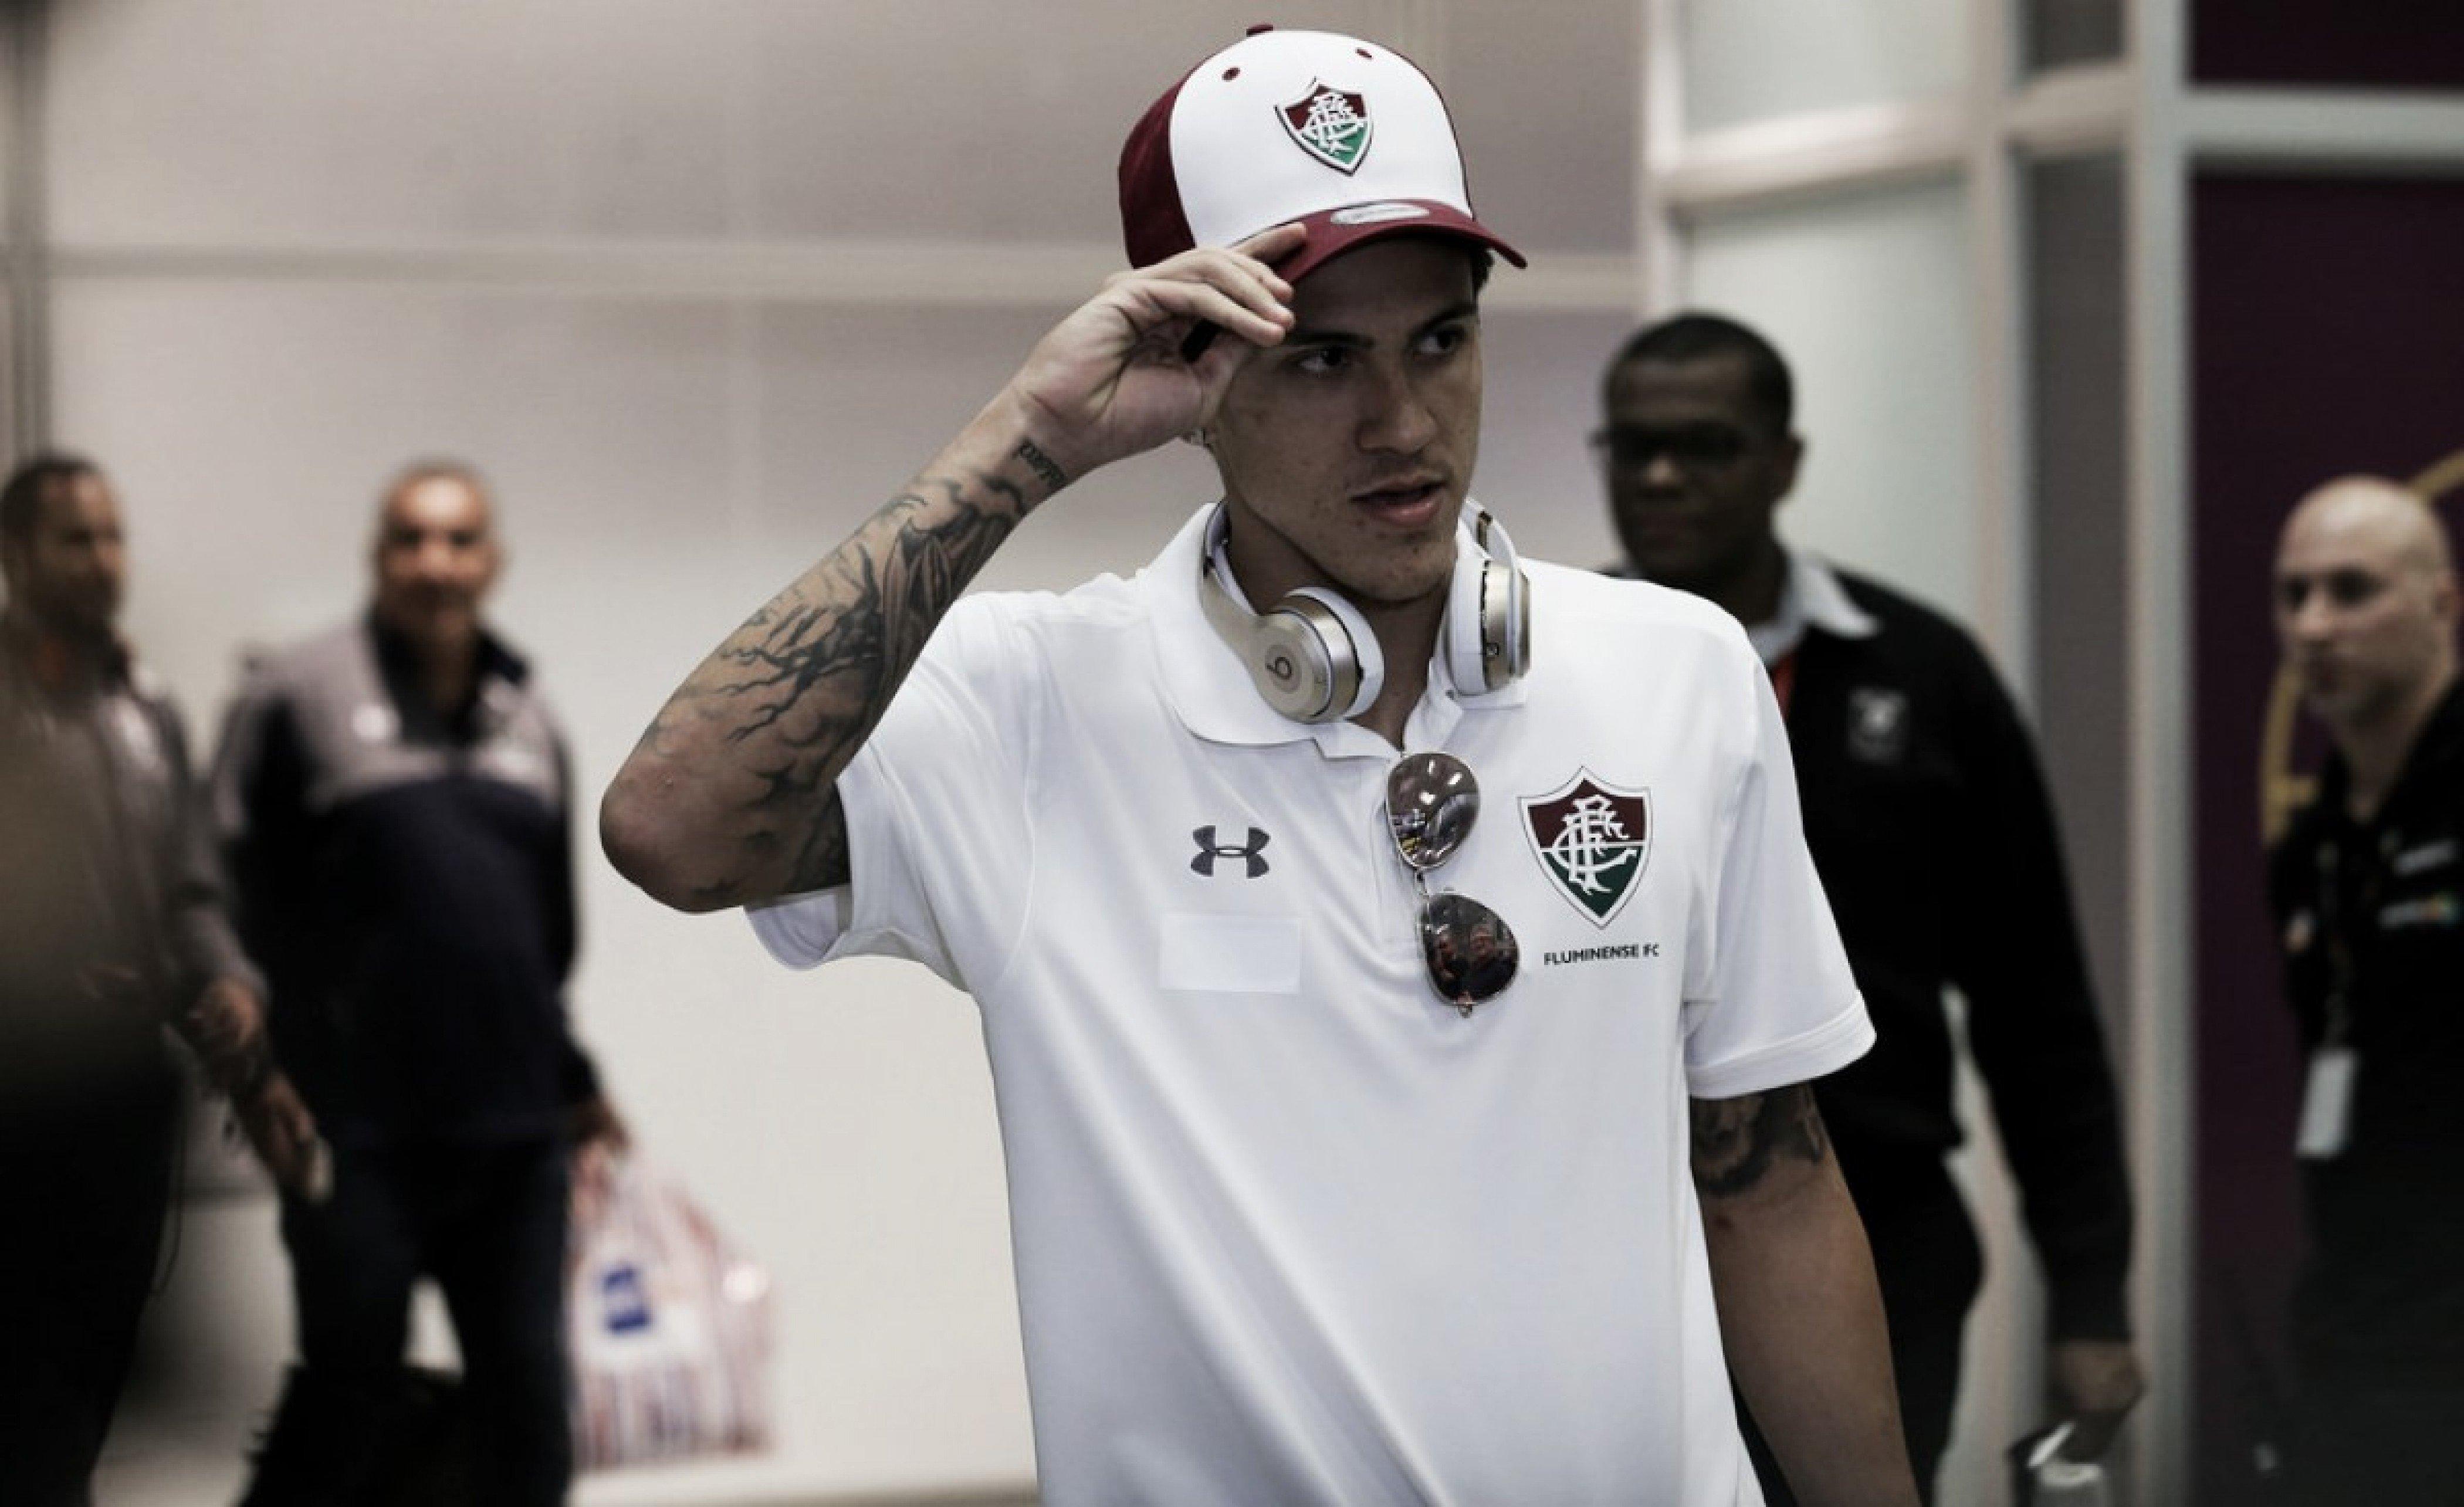 Pedro passará por cirurgia e só voltará a jogar pelo Fluminense em 2019